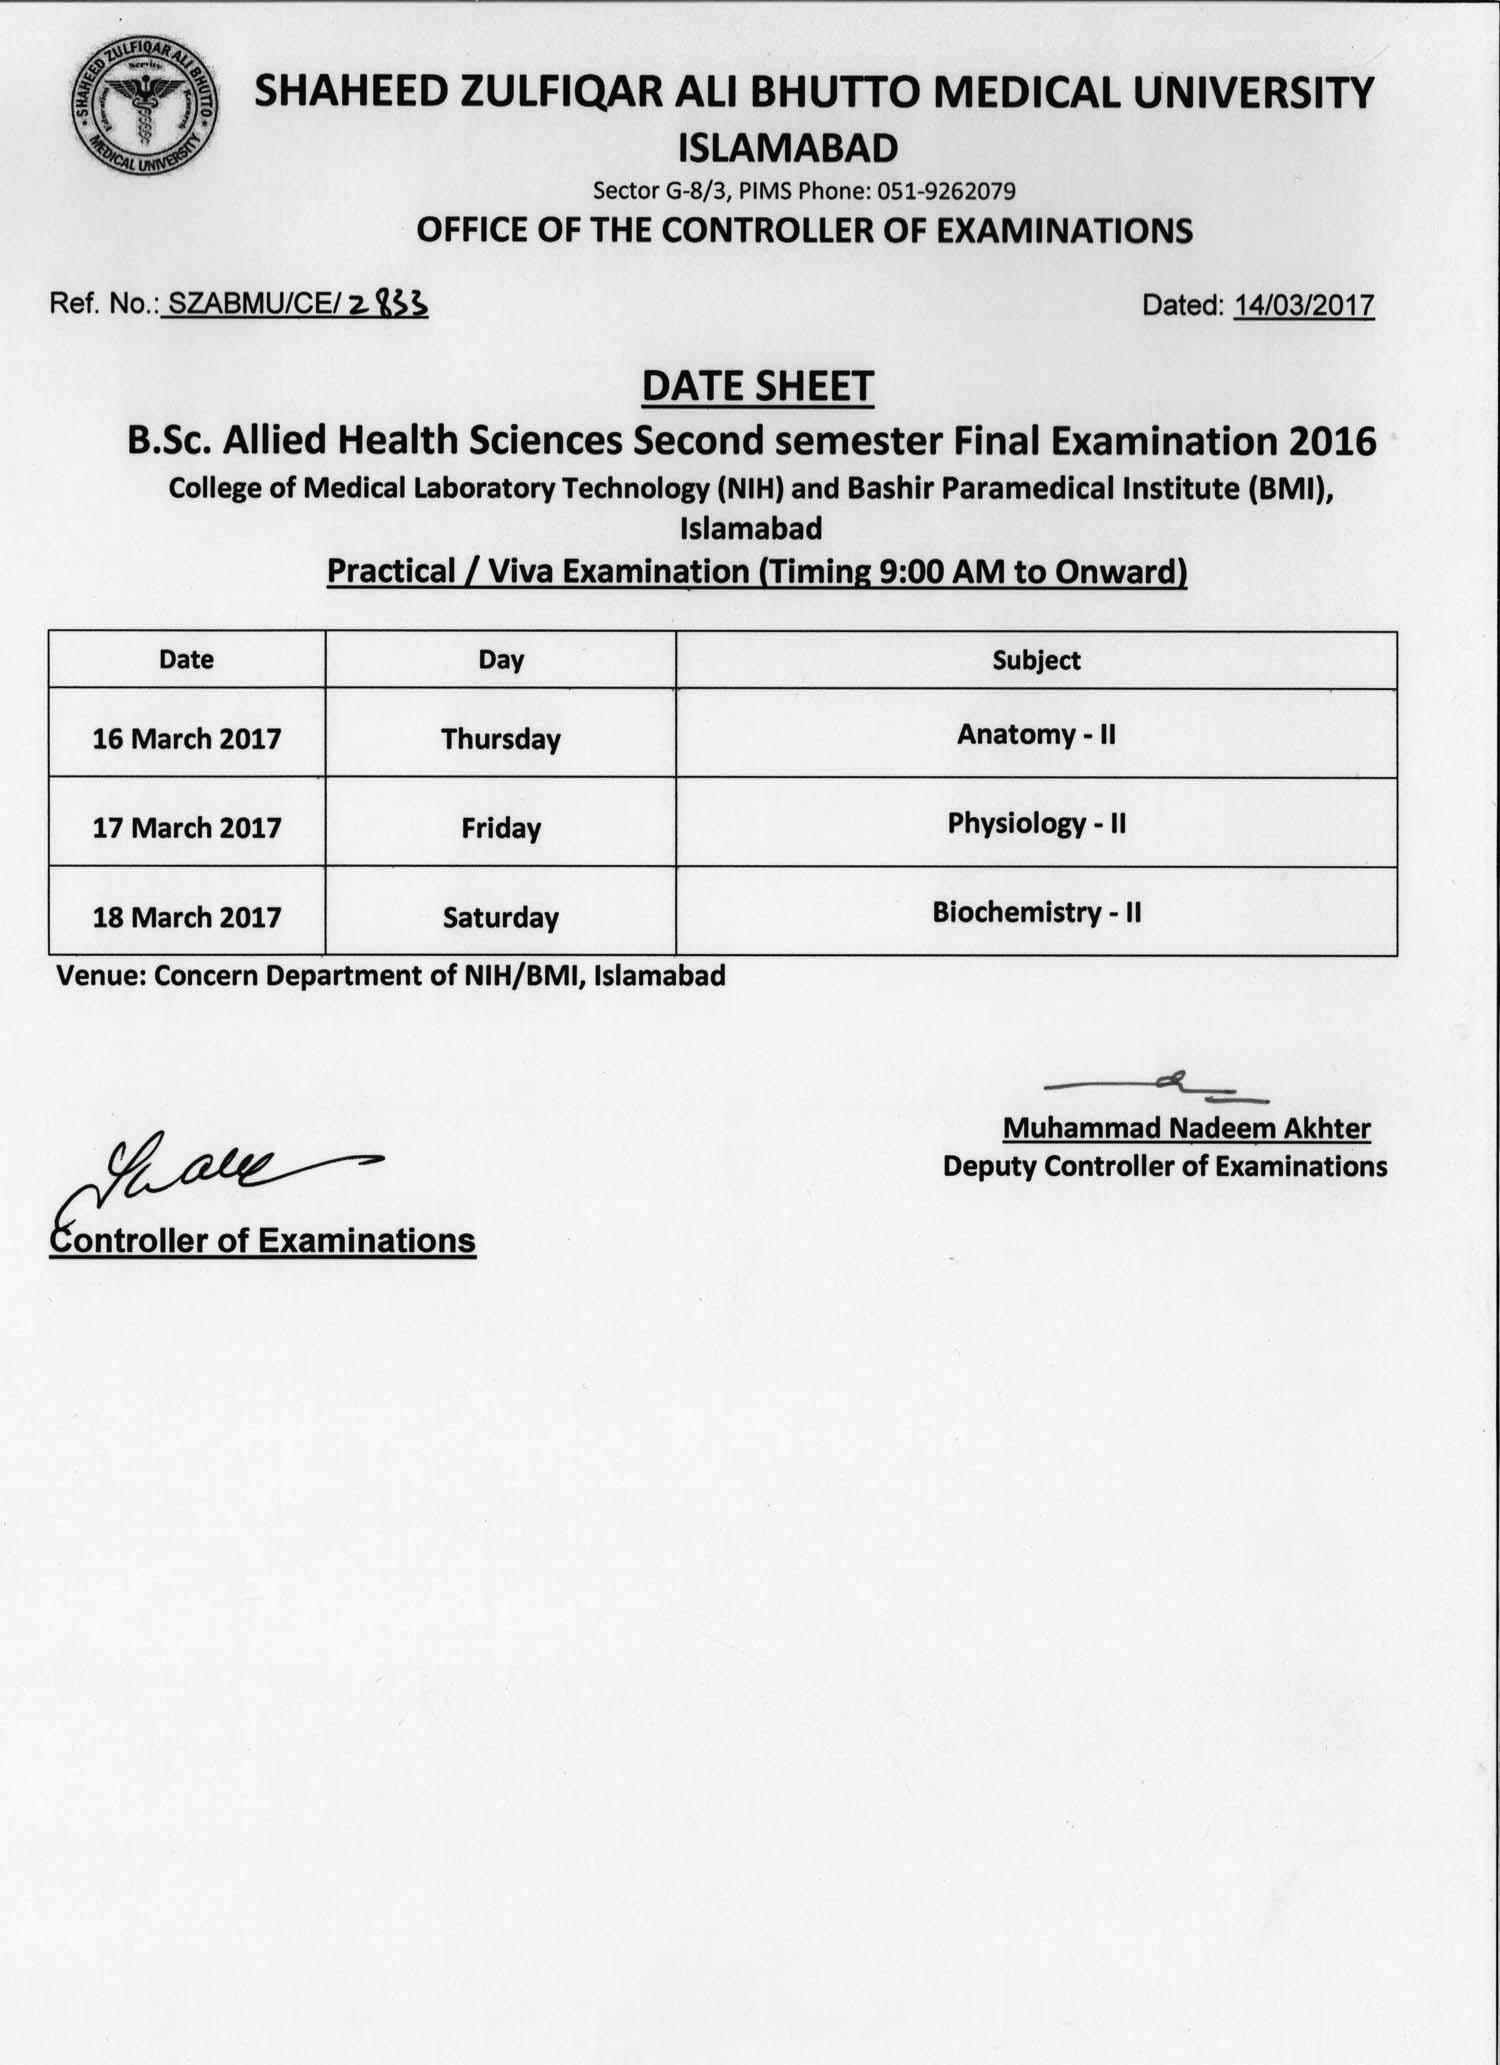 Date Sheet - B.Sc. Allied Health Sciences Final Exams 2016